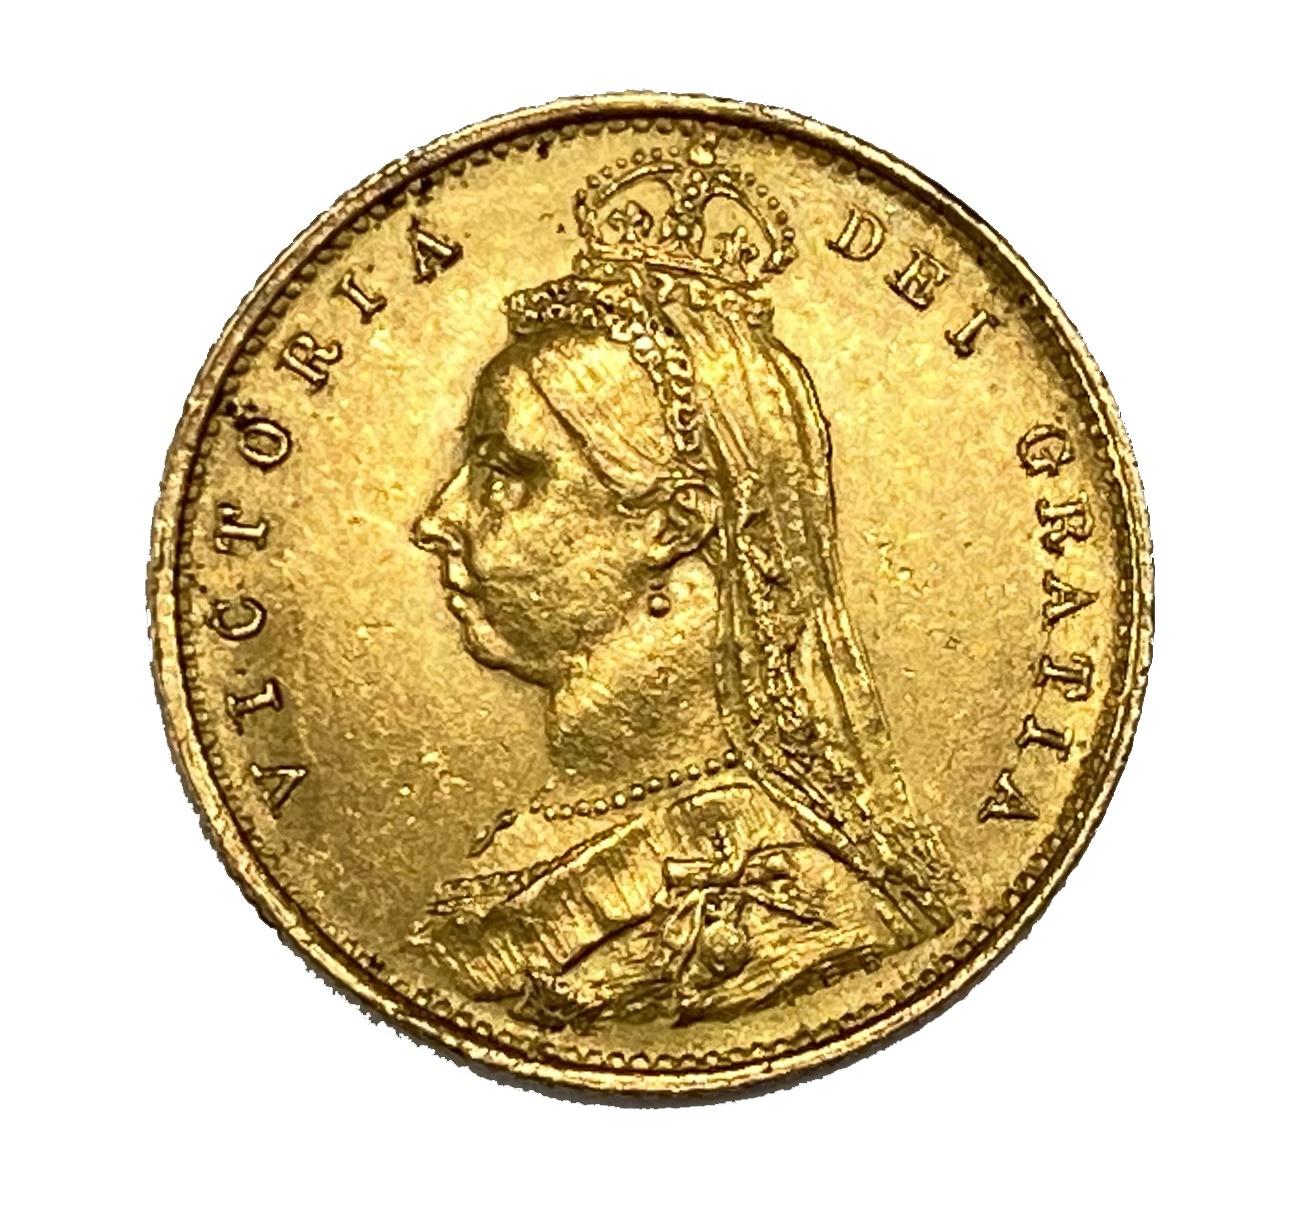 Victoria gold half Sovereign, 1887